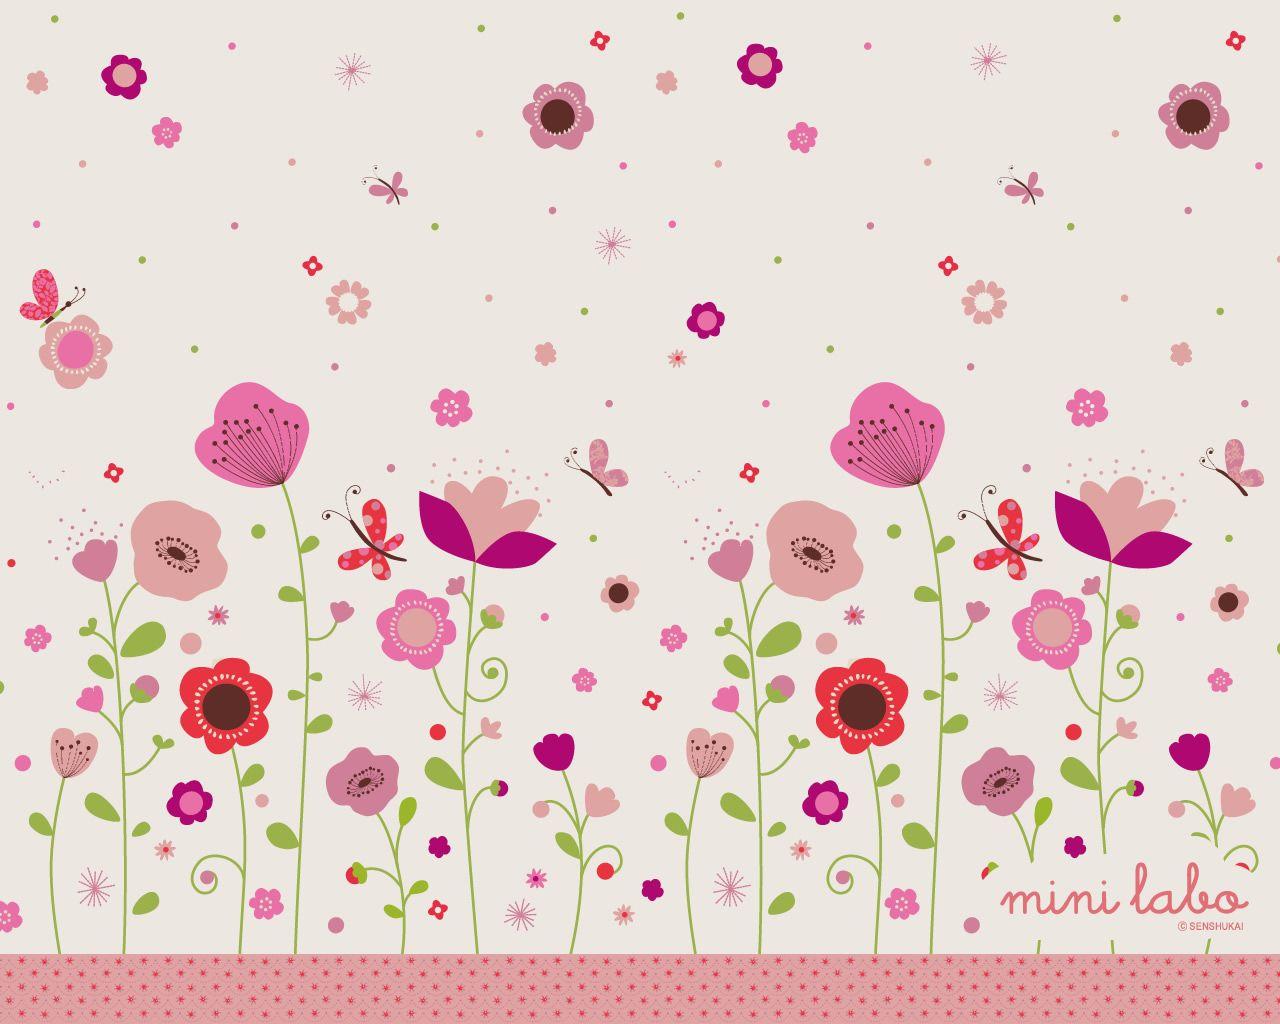 free pc wall paper by mini labo | * pc wall paper * | pinterest